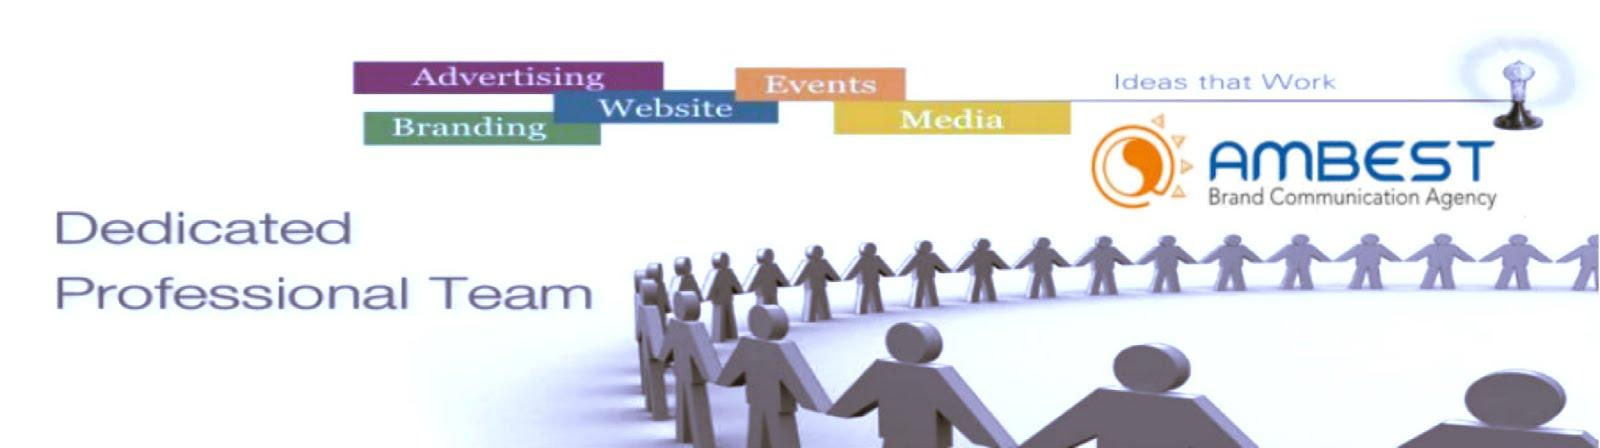 Ambest Media - Idea that Works !